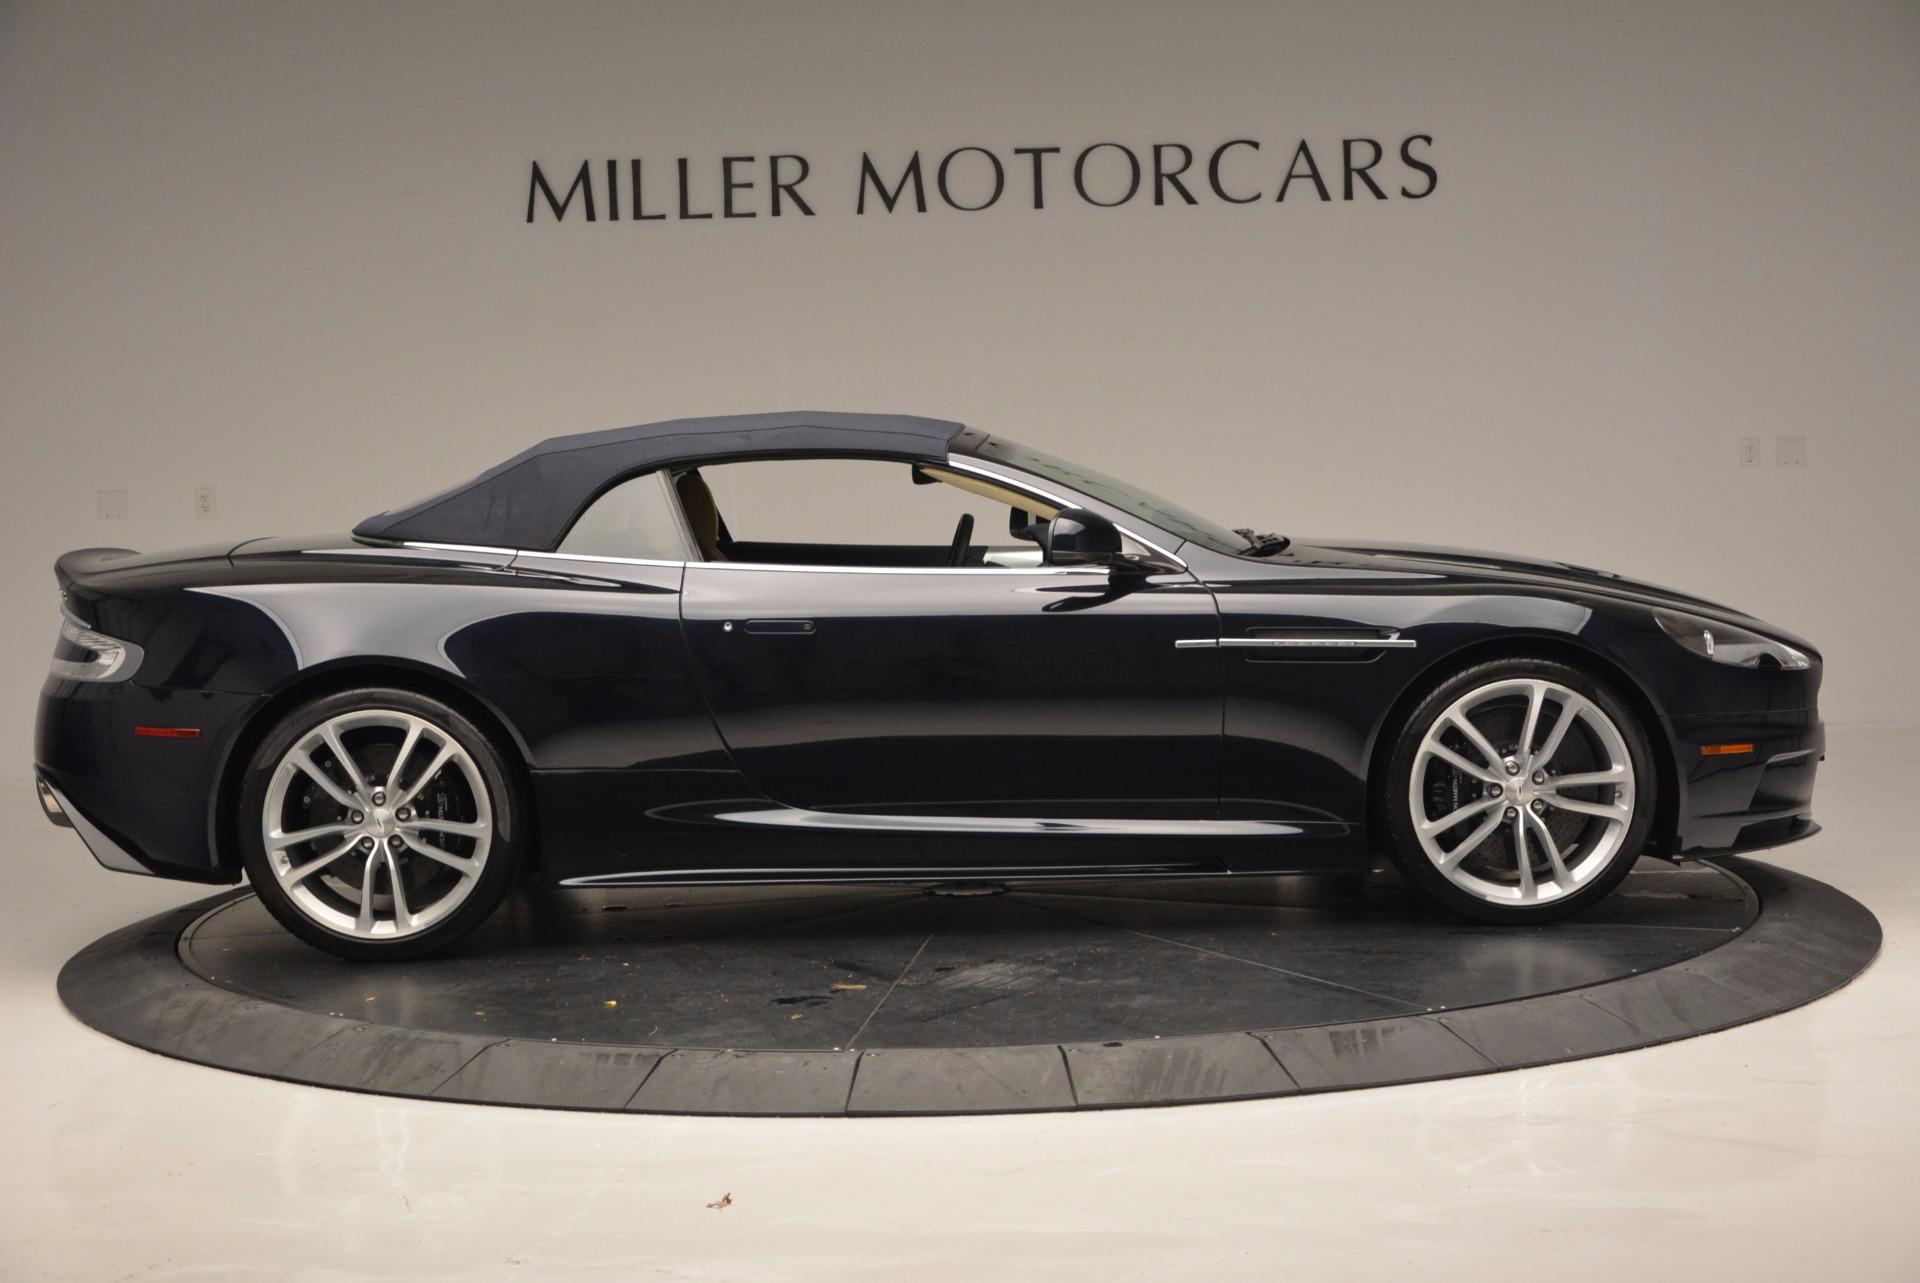 Used 2012 Aston Martin DBS Volante For Sale In Greenwich, CT 644_p21